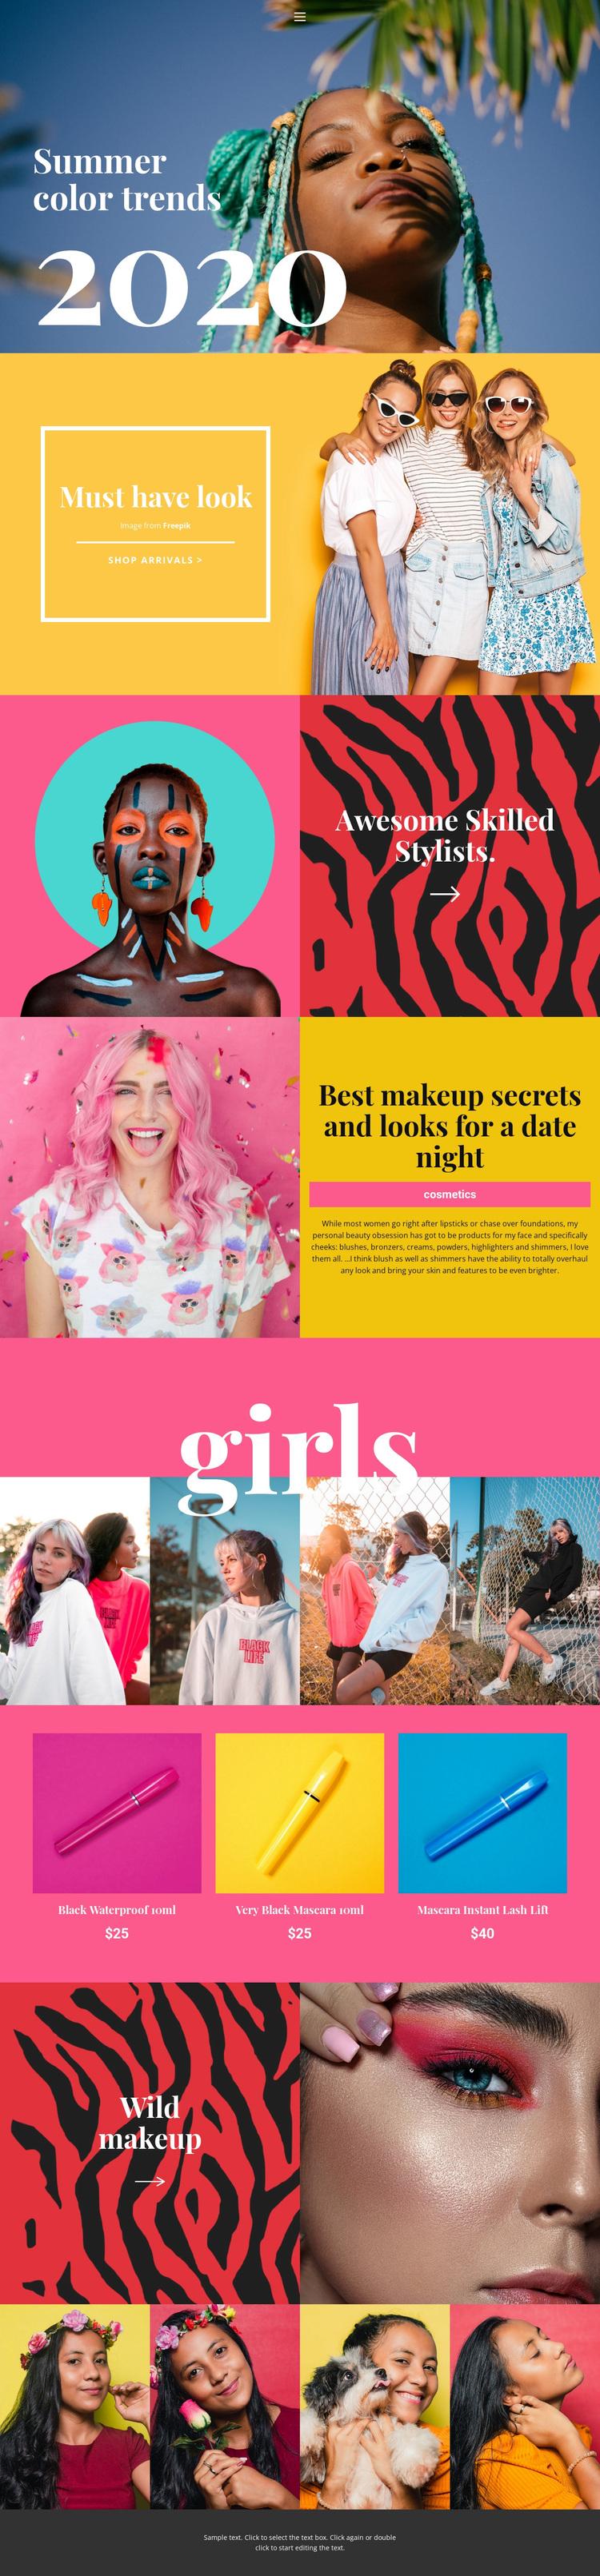 Beauty trends info Template